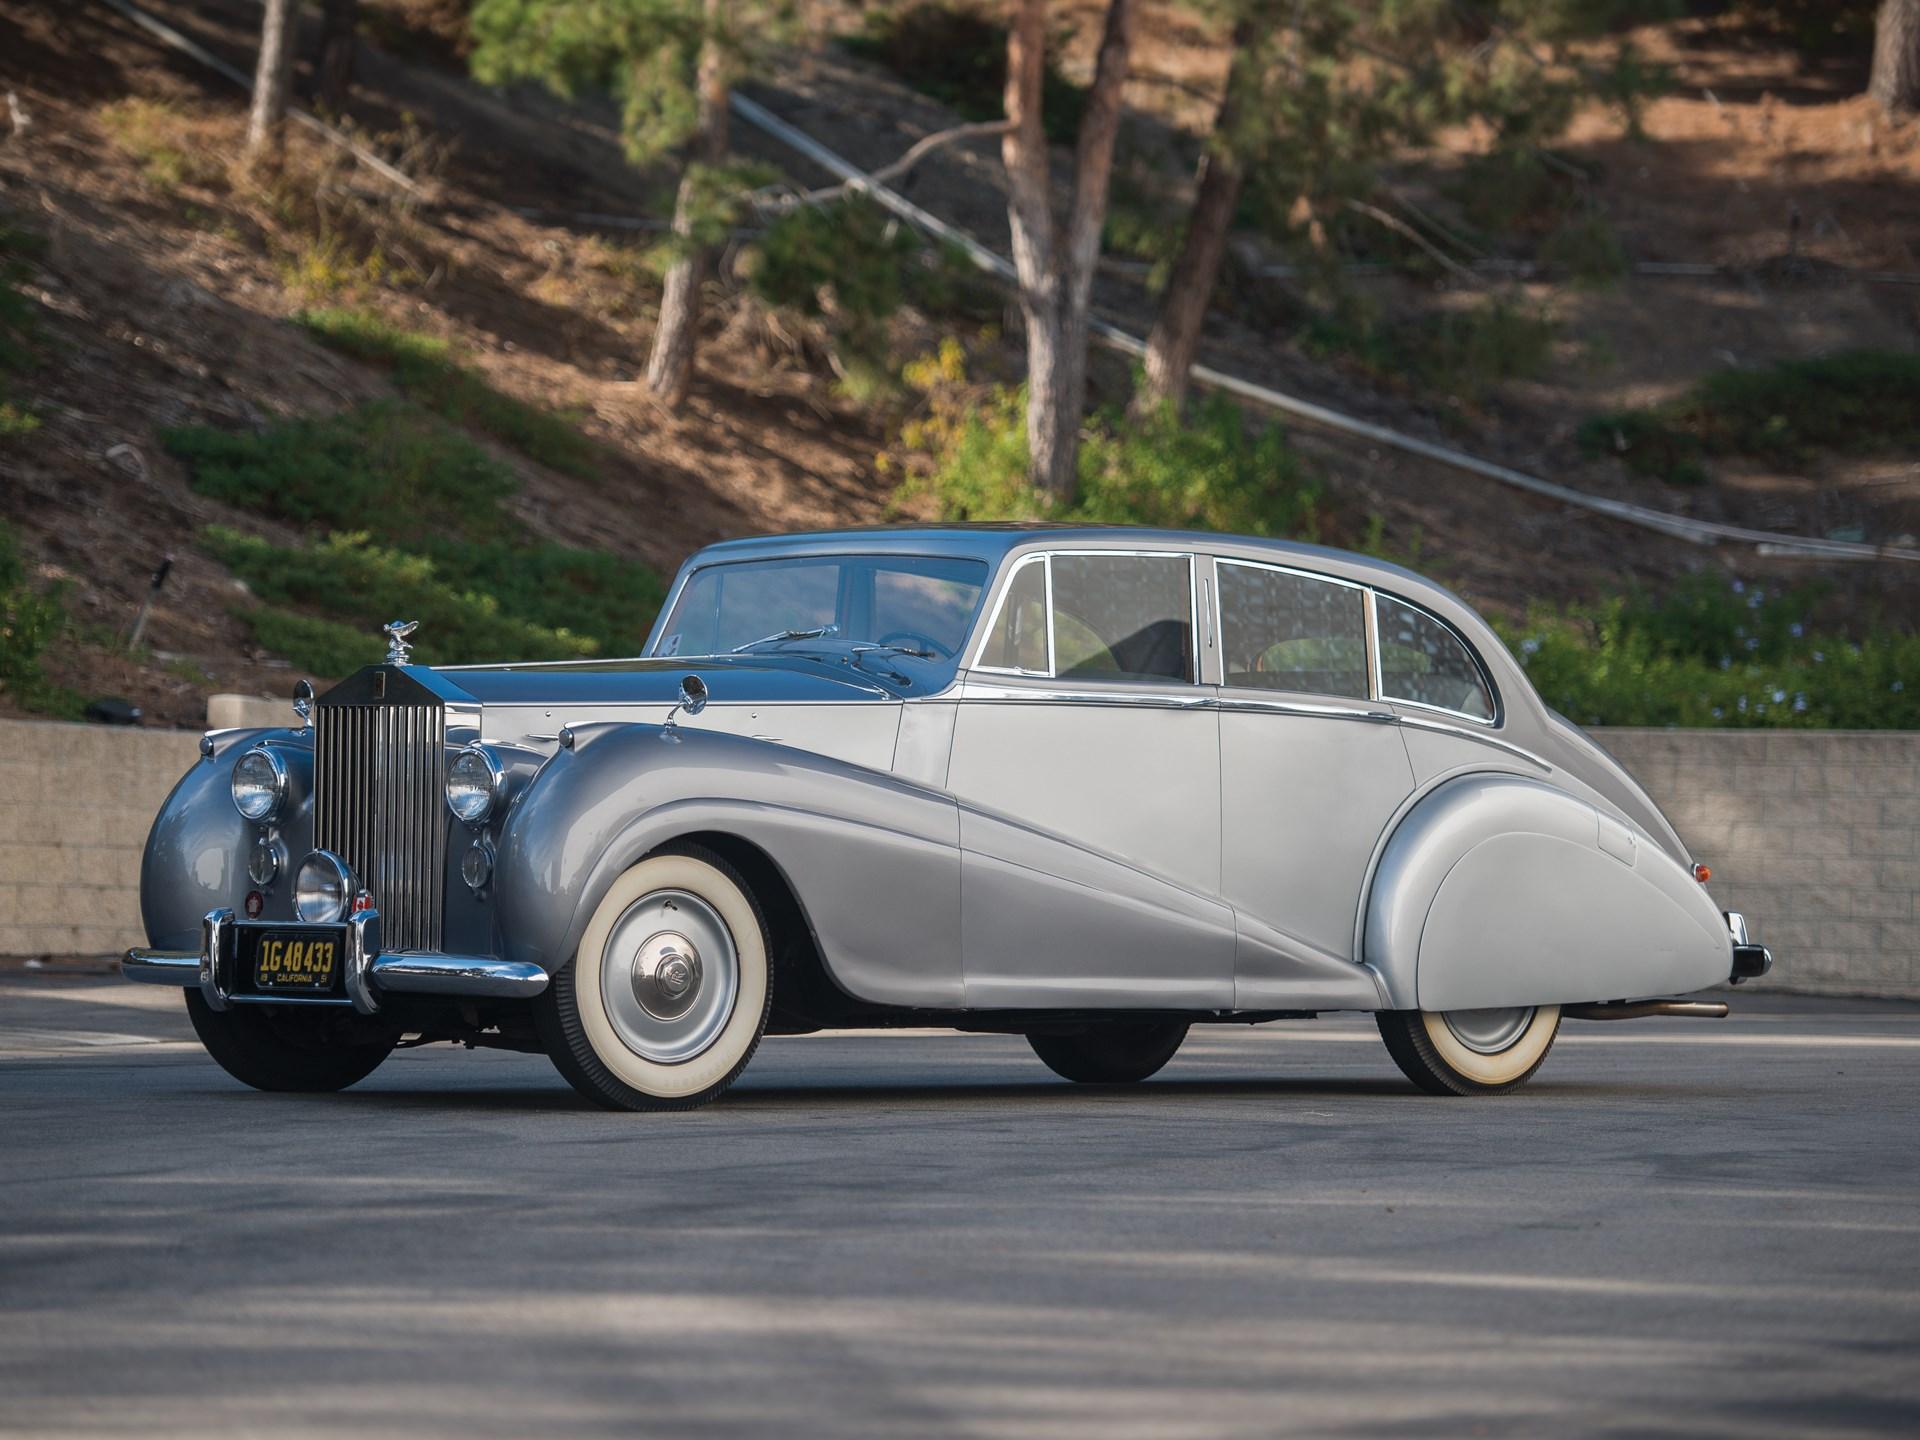 Rolls Royce Silver Seraph Wiring Diagram And Schematics 1974 1976 Shadow 1991 At Nhrt 1951